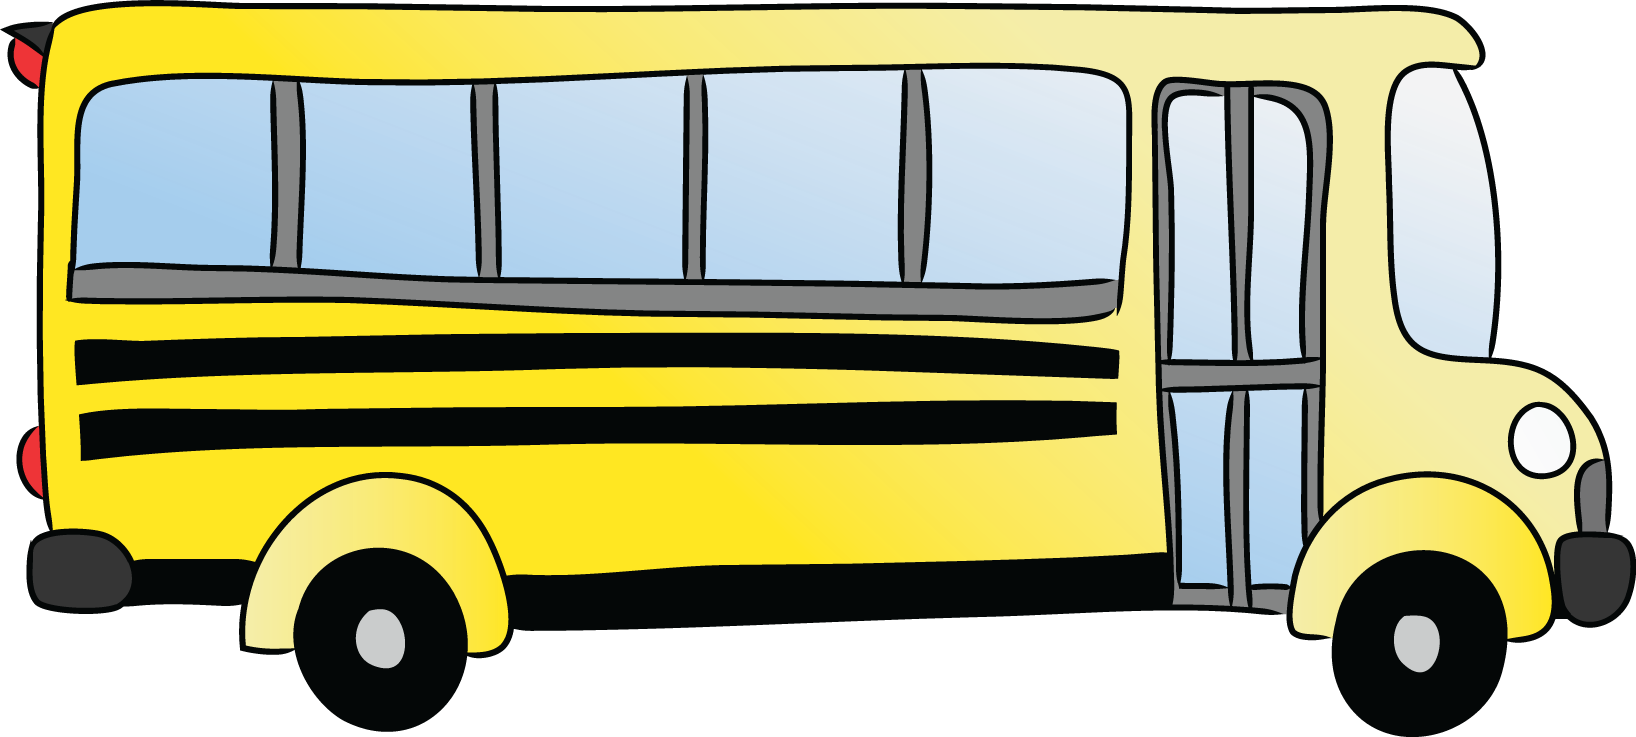 1636x737 Free Cartoon School Bus Clip Art